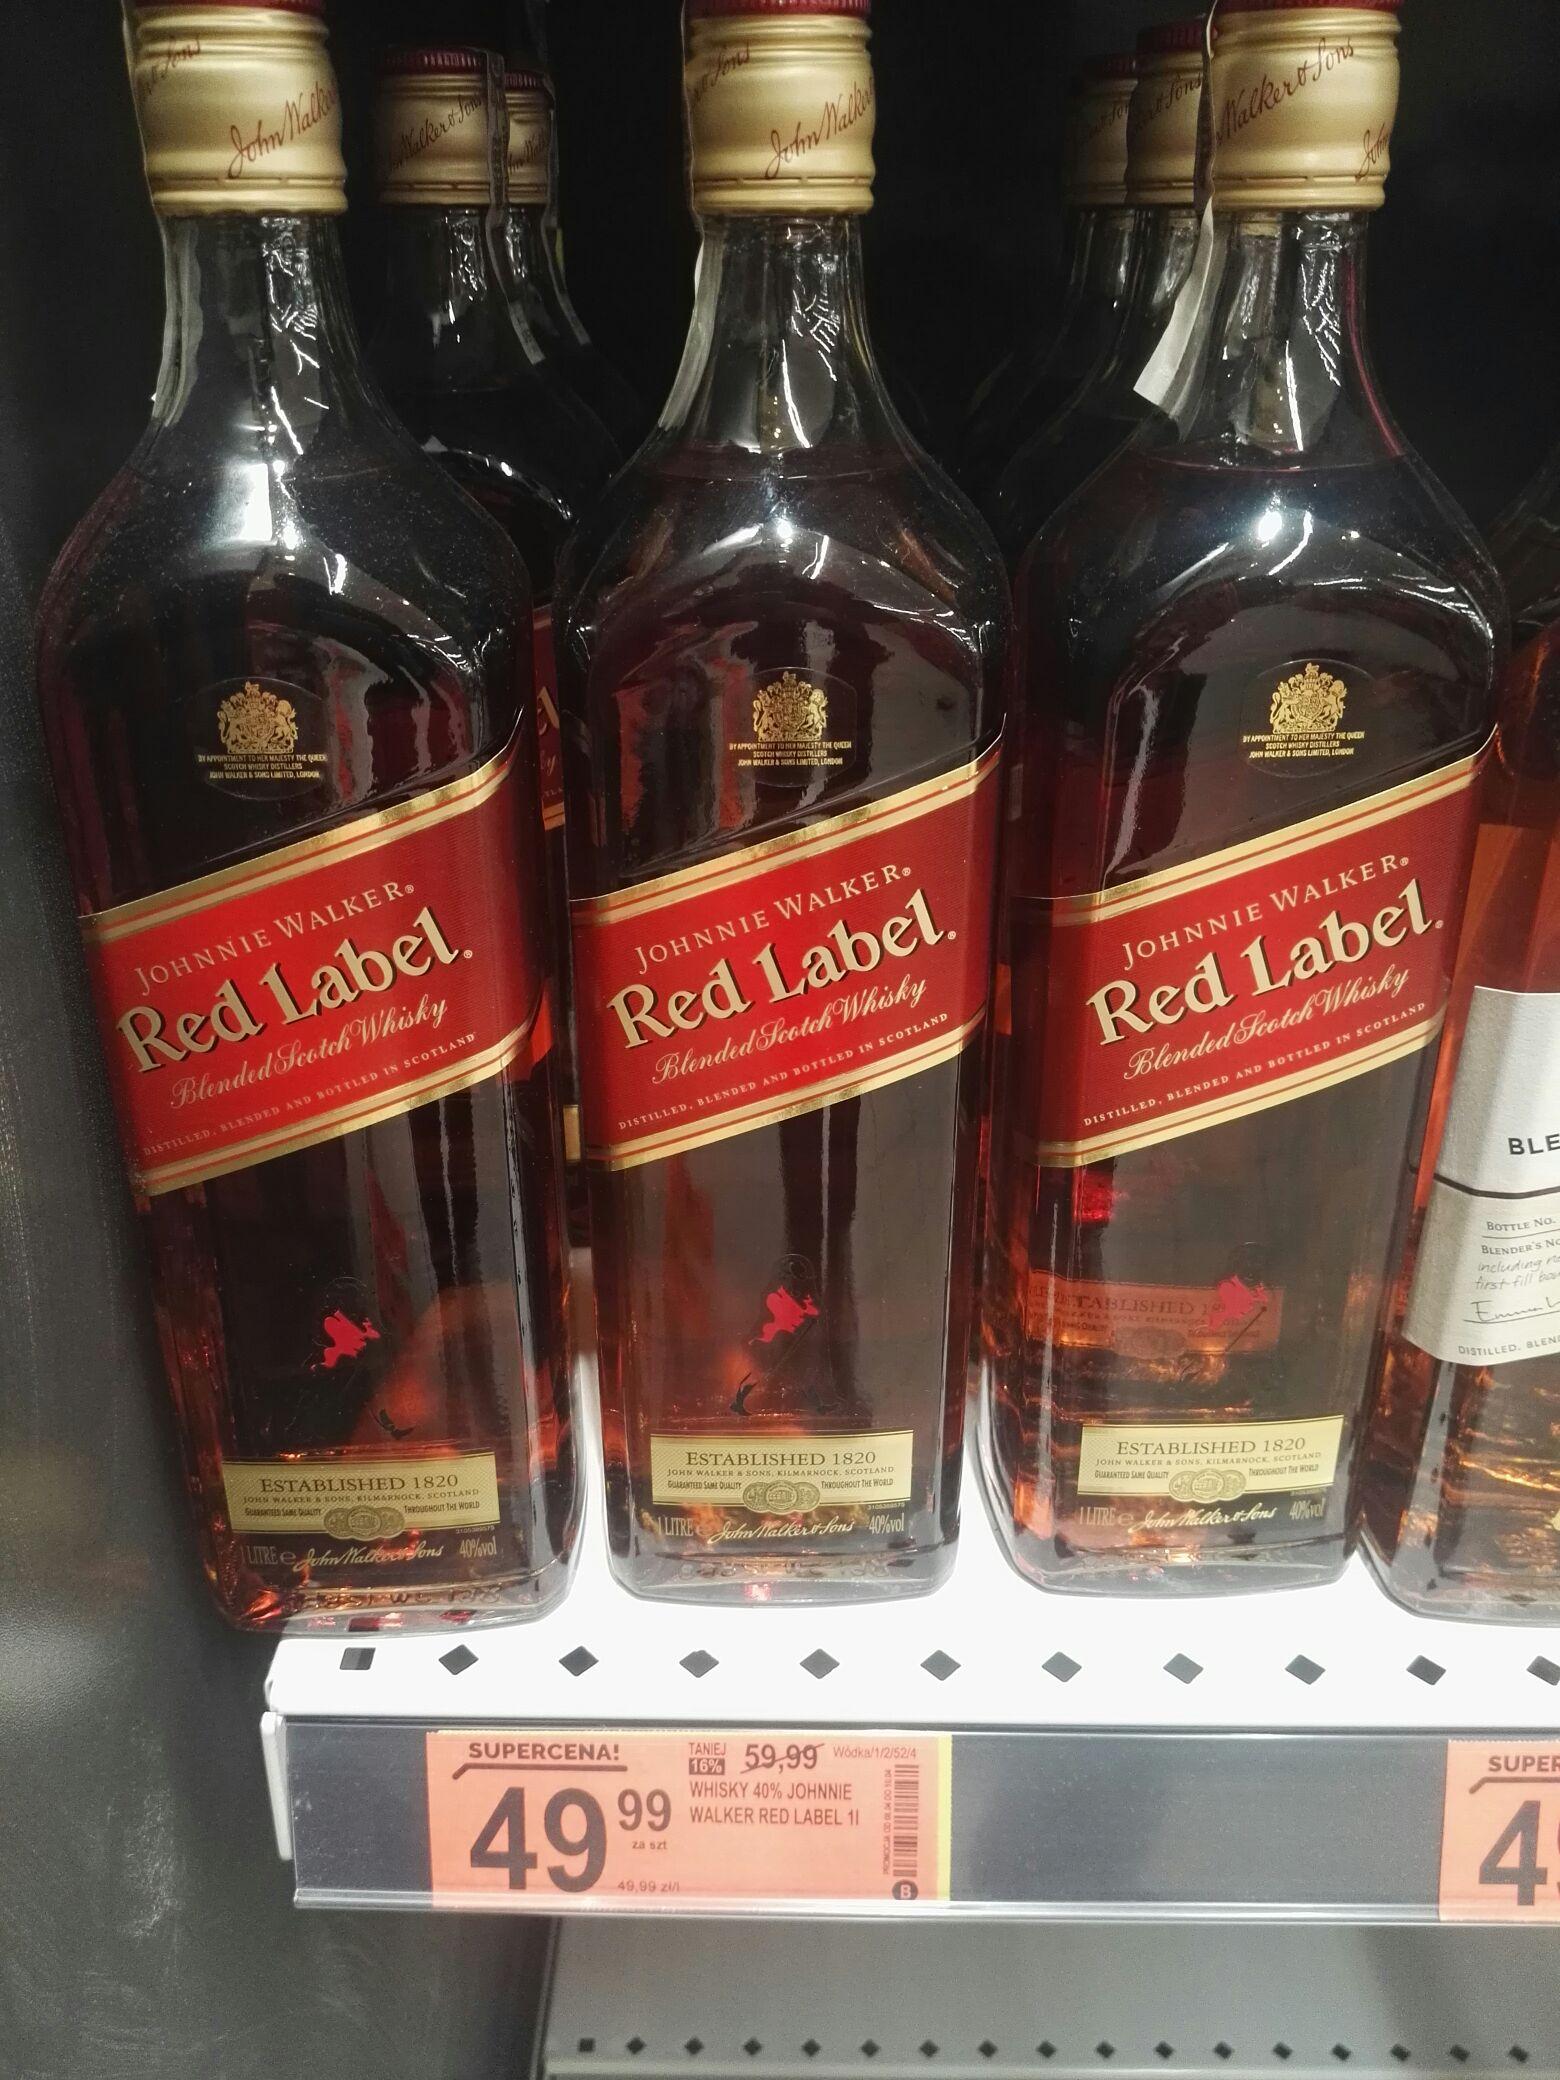 1 litr Johnnie Walker red Biedronka 49.99